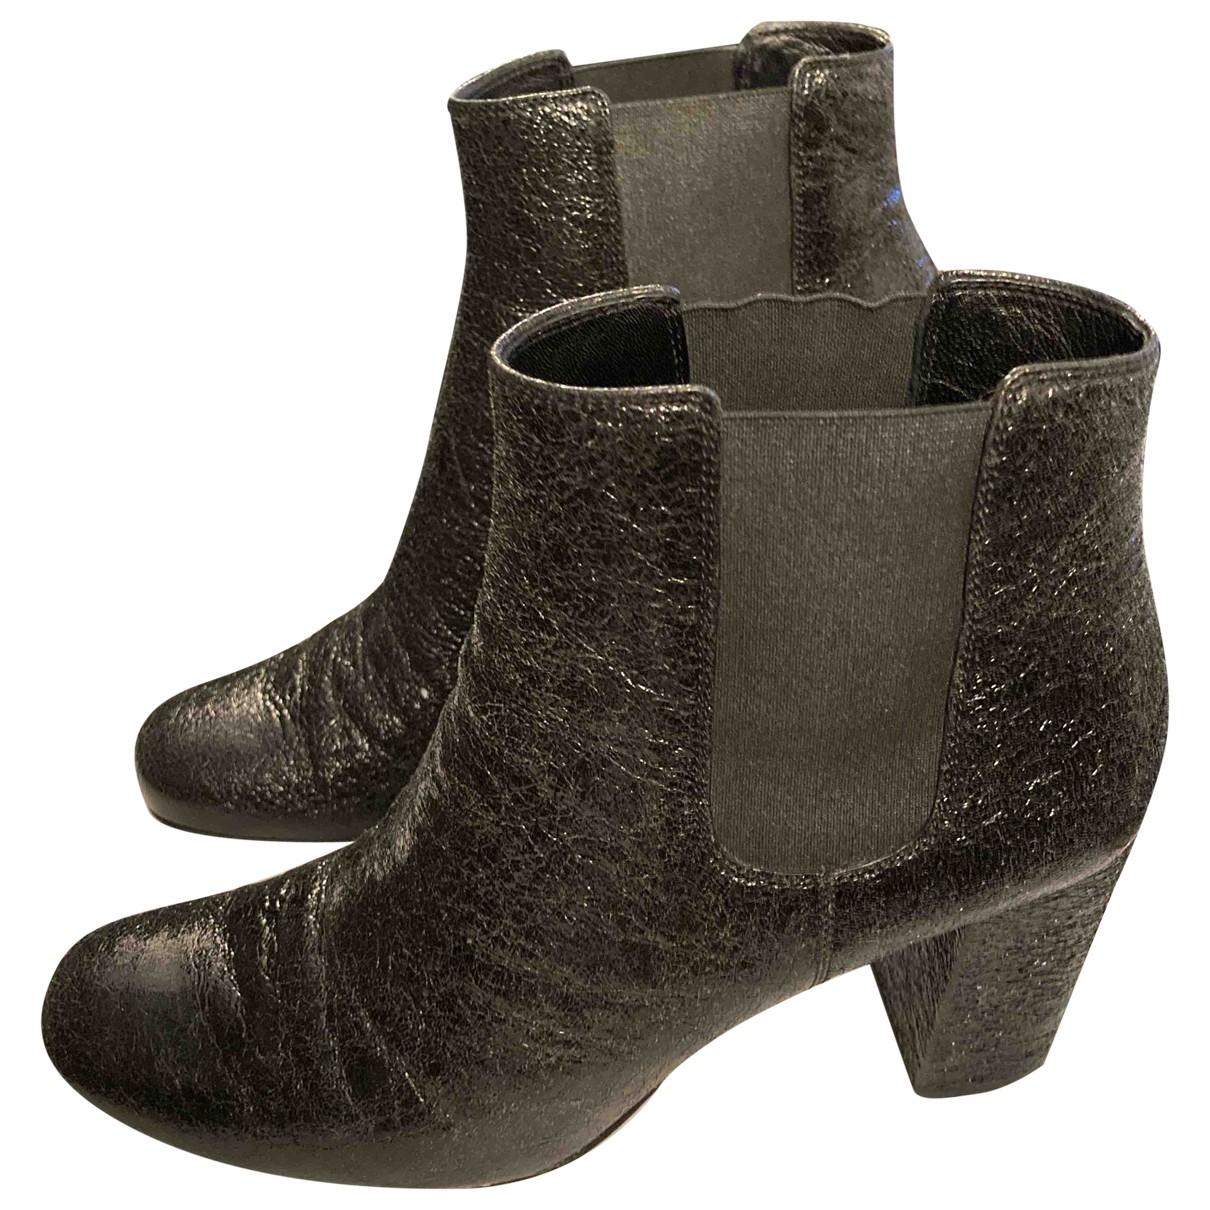 Saint Laurent N Black Patent leather Ankle boots for Women 39 EU